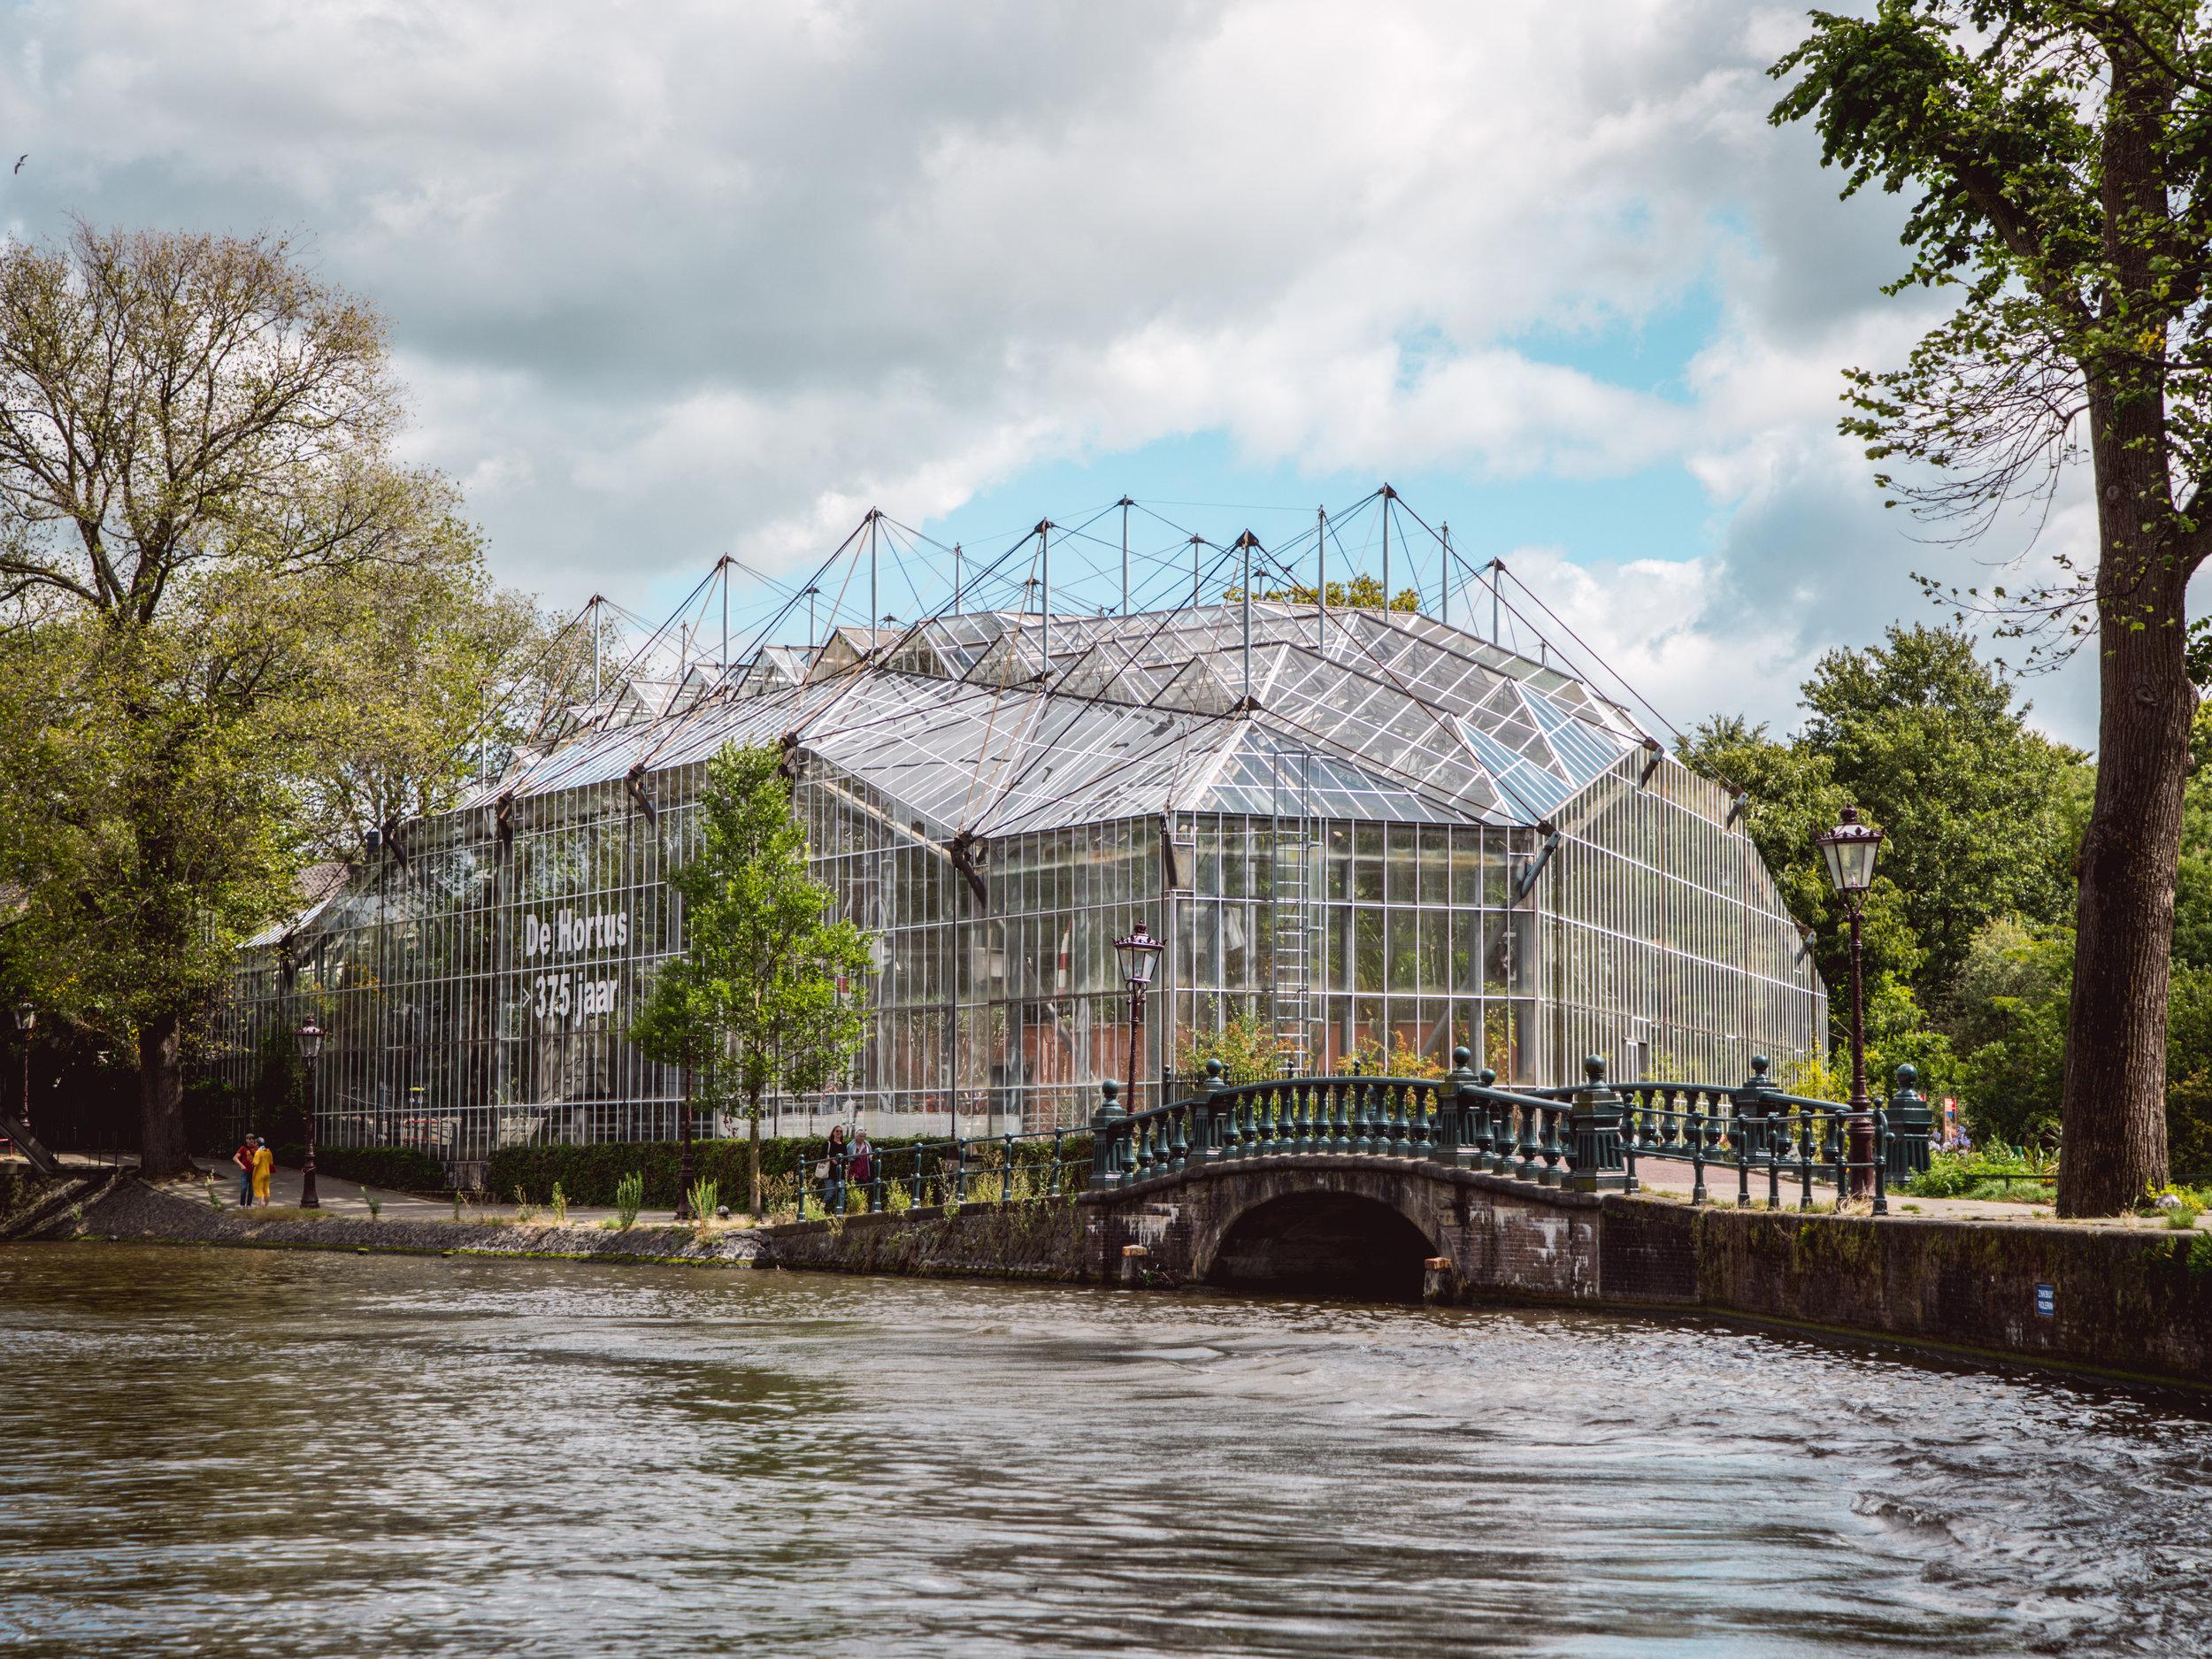 LilyHeaton_Hortus Botanicus_Amsterdam.jpg